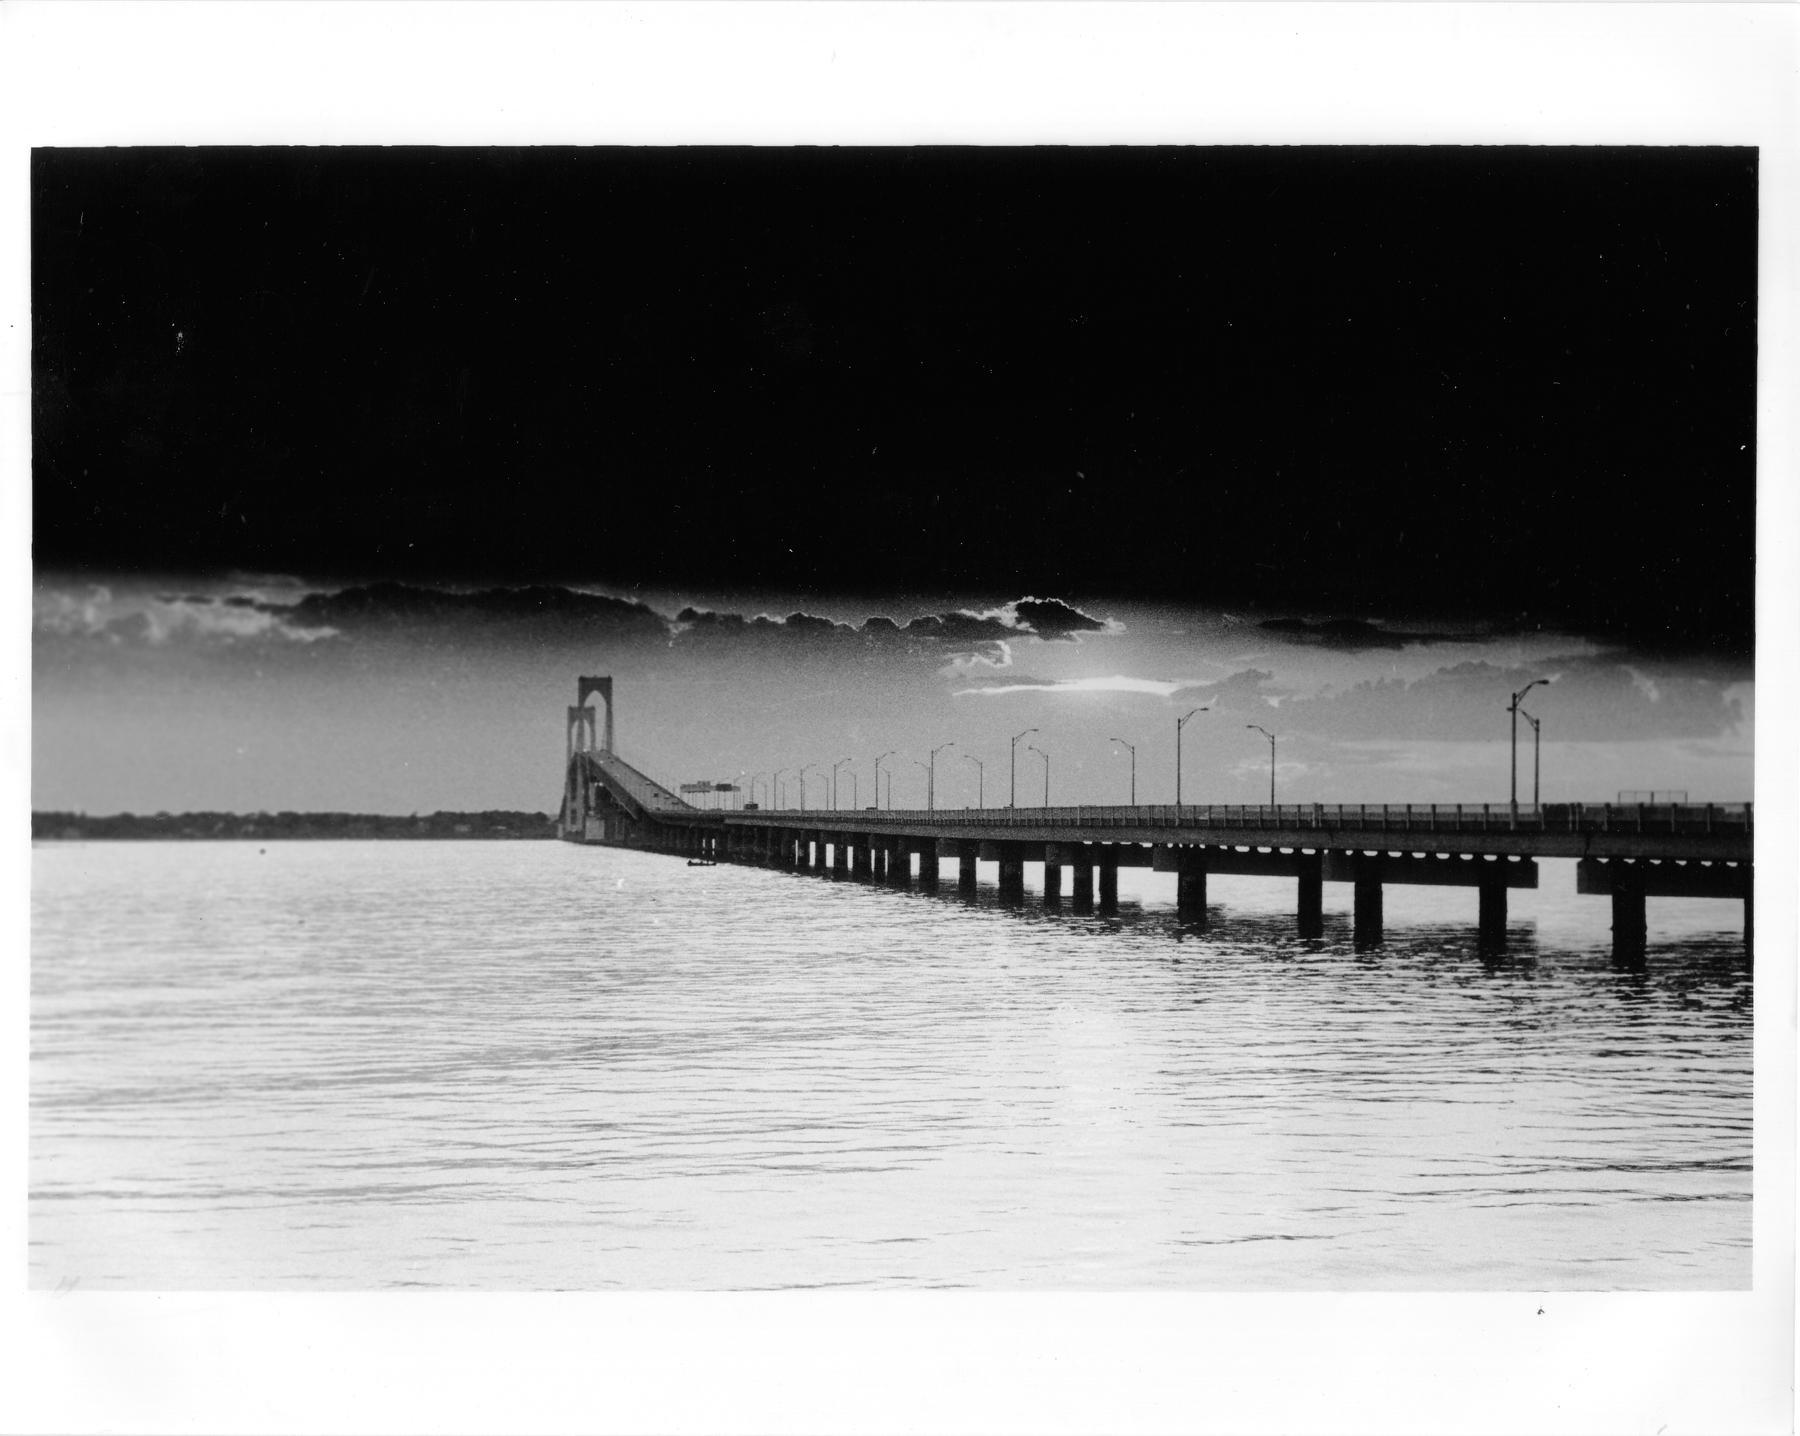 Newport Bridge. by Vestiphobia